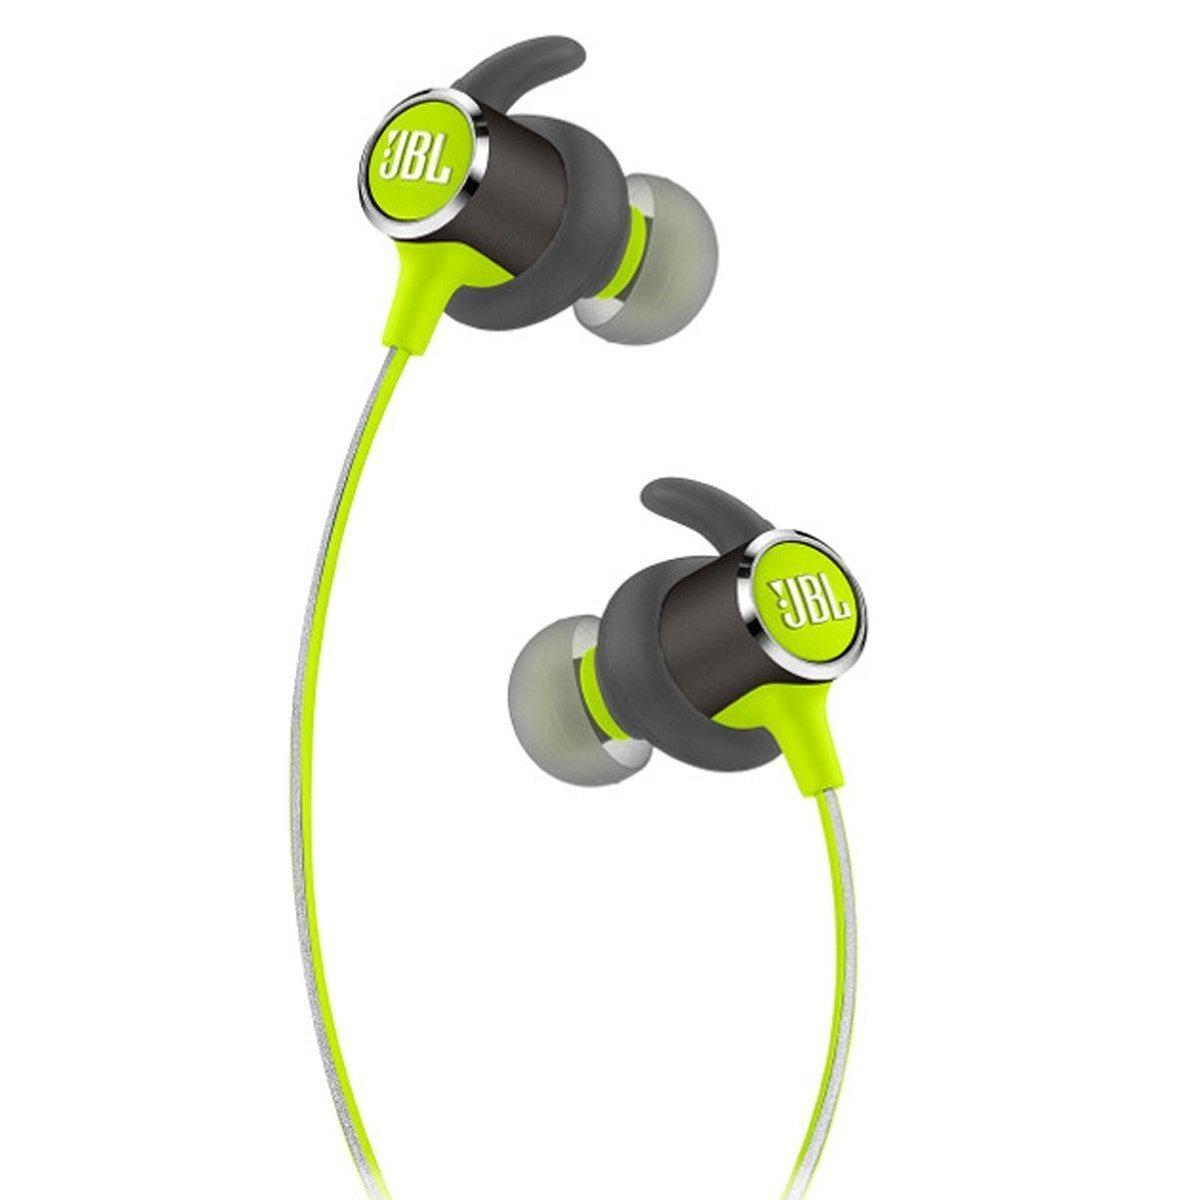 f7fa340a141 Buyr.com - JBL Reflect Mini 2 Wireless In-Ear Sport Headphones with ...